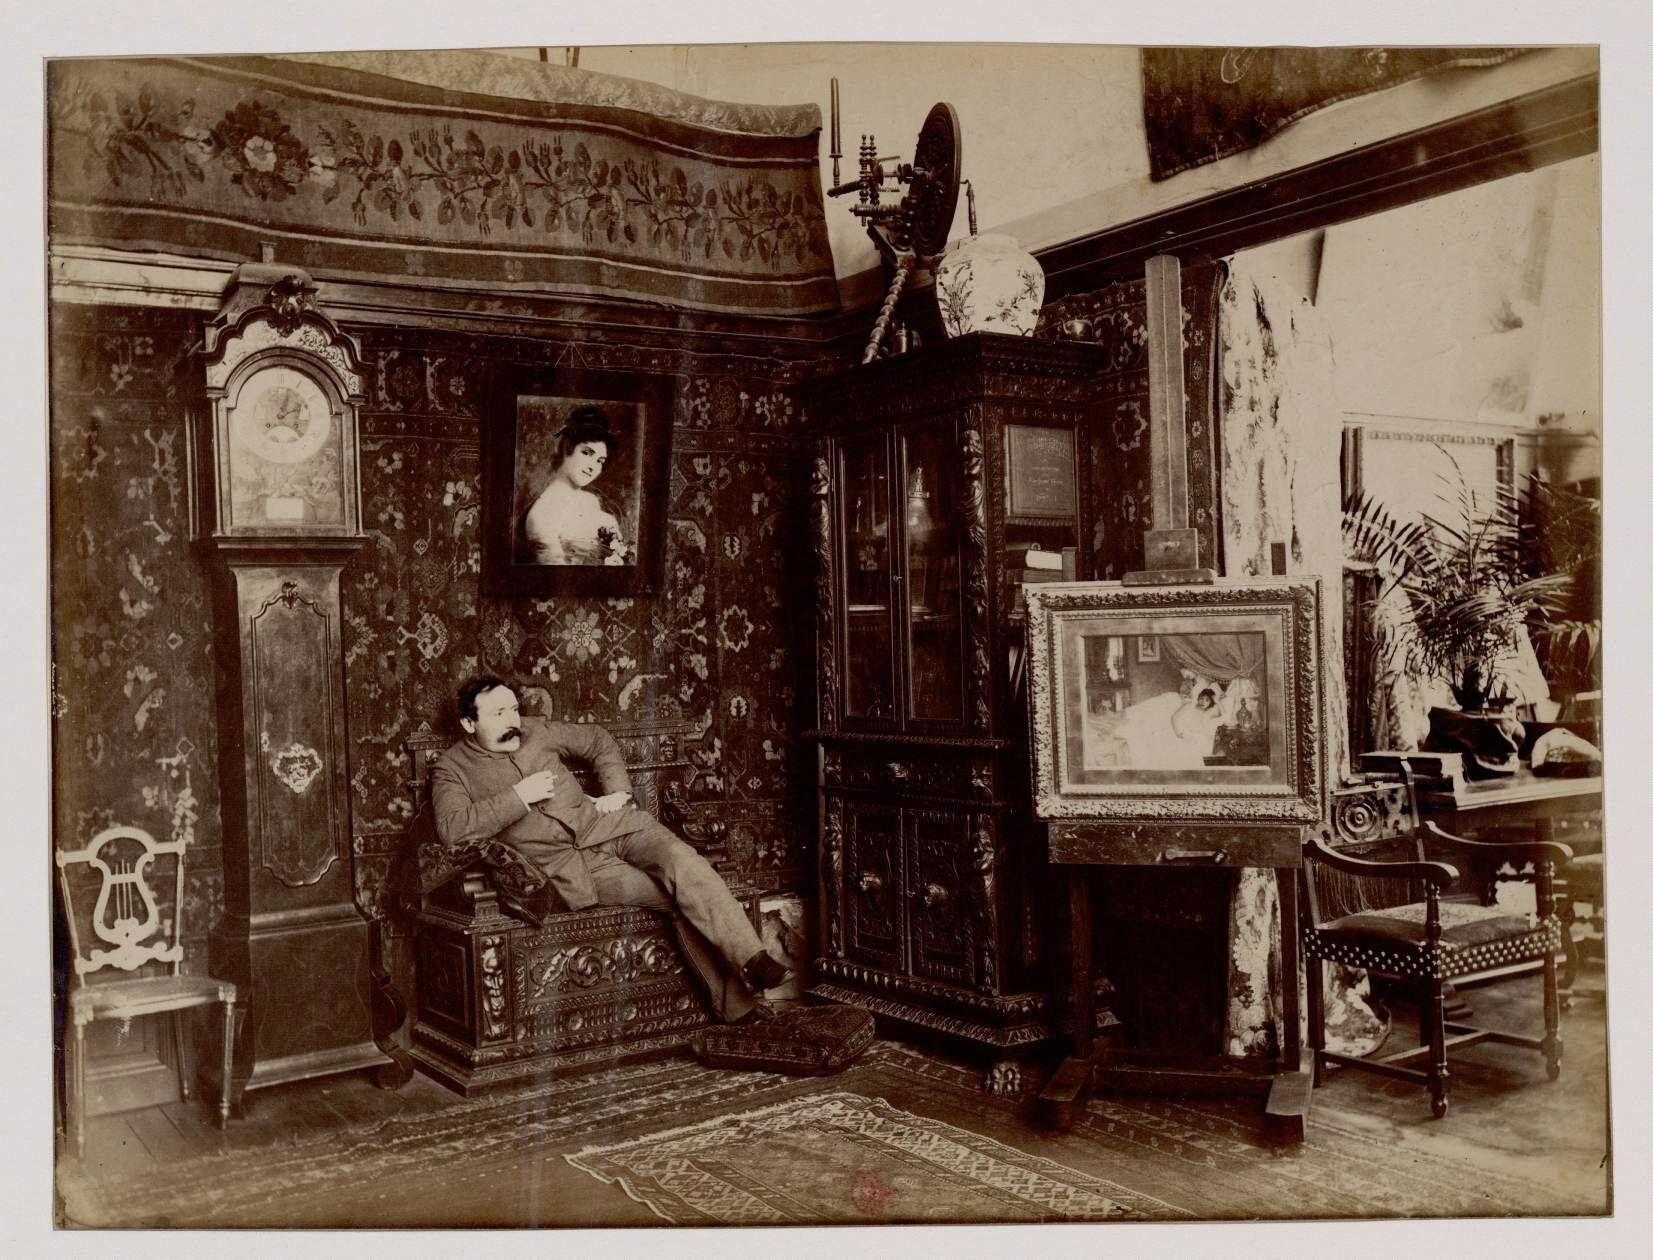 Хосе Фраппа (1854-1904) — французский художник